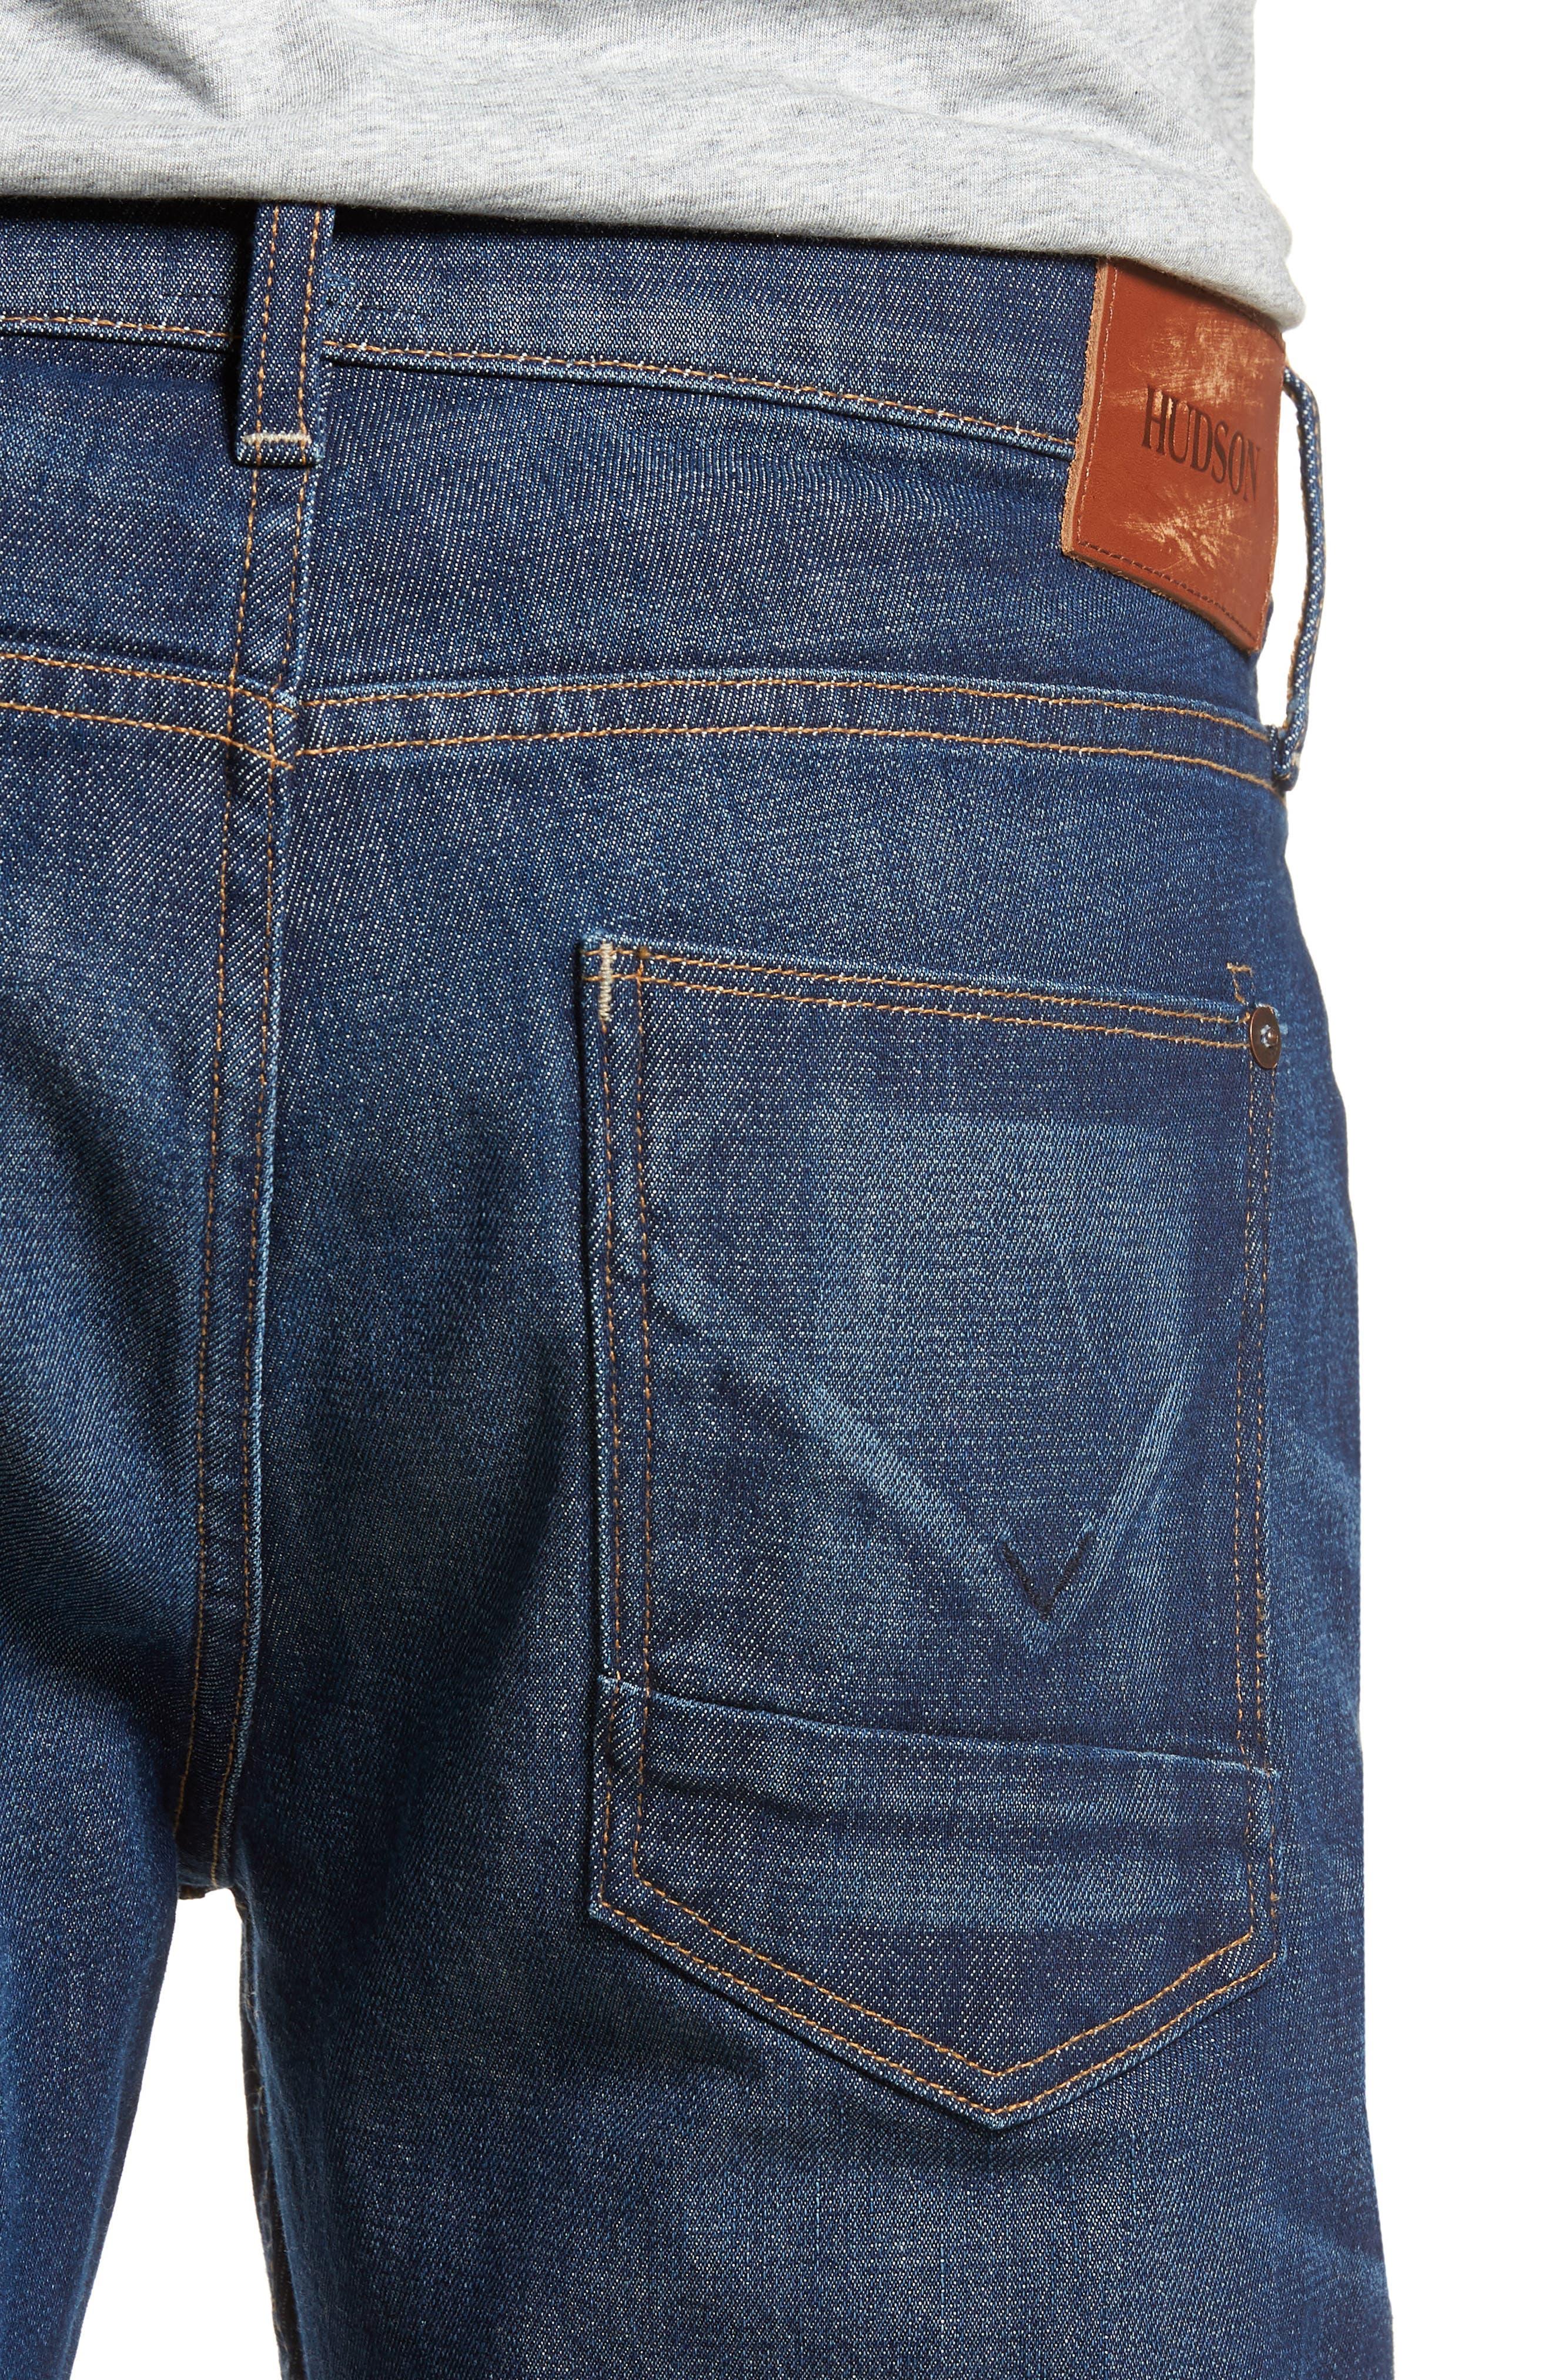 Blake Slim Fit Jeans,                             Alternate thumbnail 4, color,